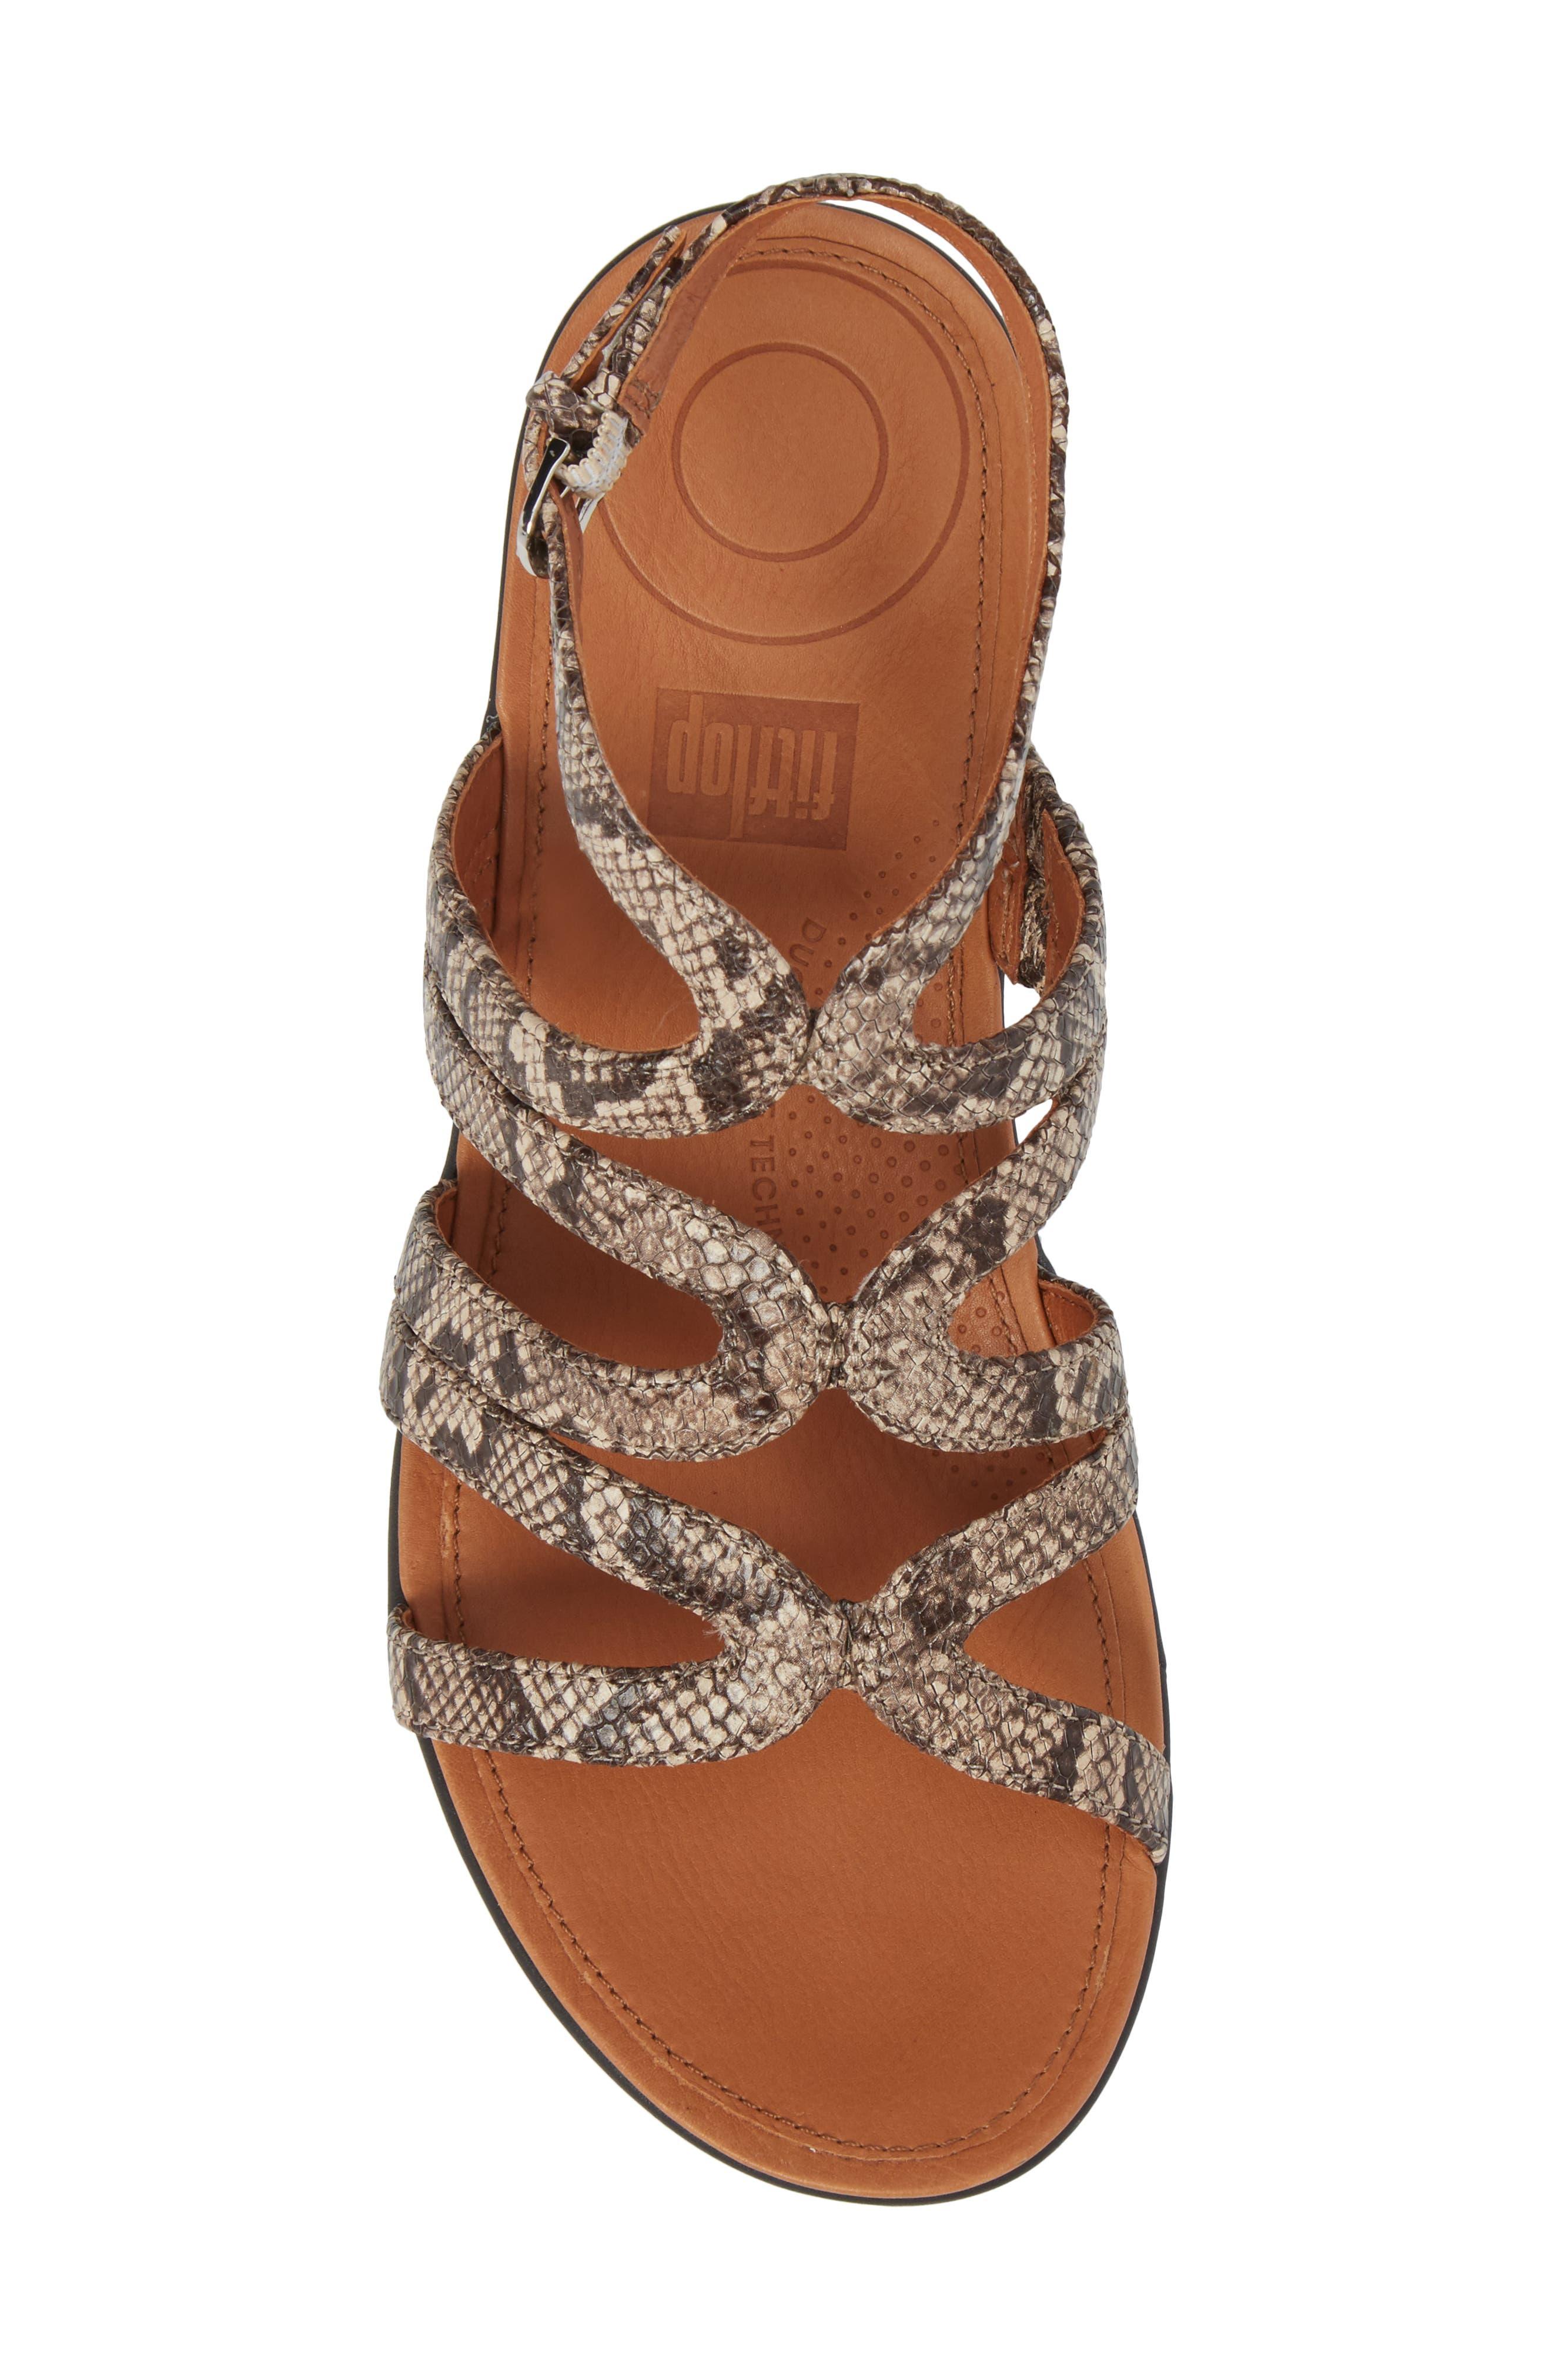 Strata Gladiator Sandal,                             Alternate thumbnail 5, color,                             Taupe Snake Print Leather